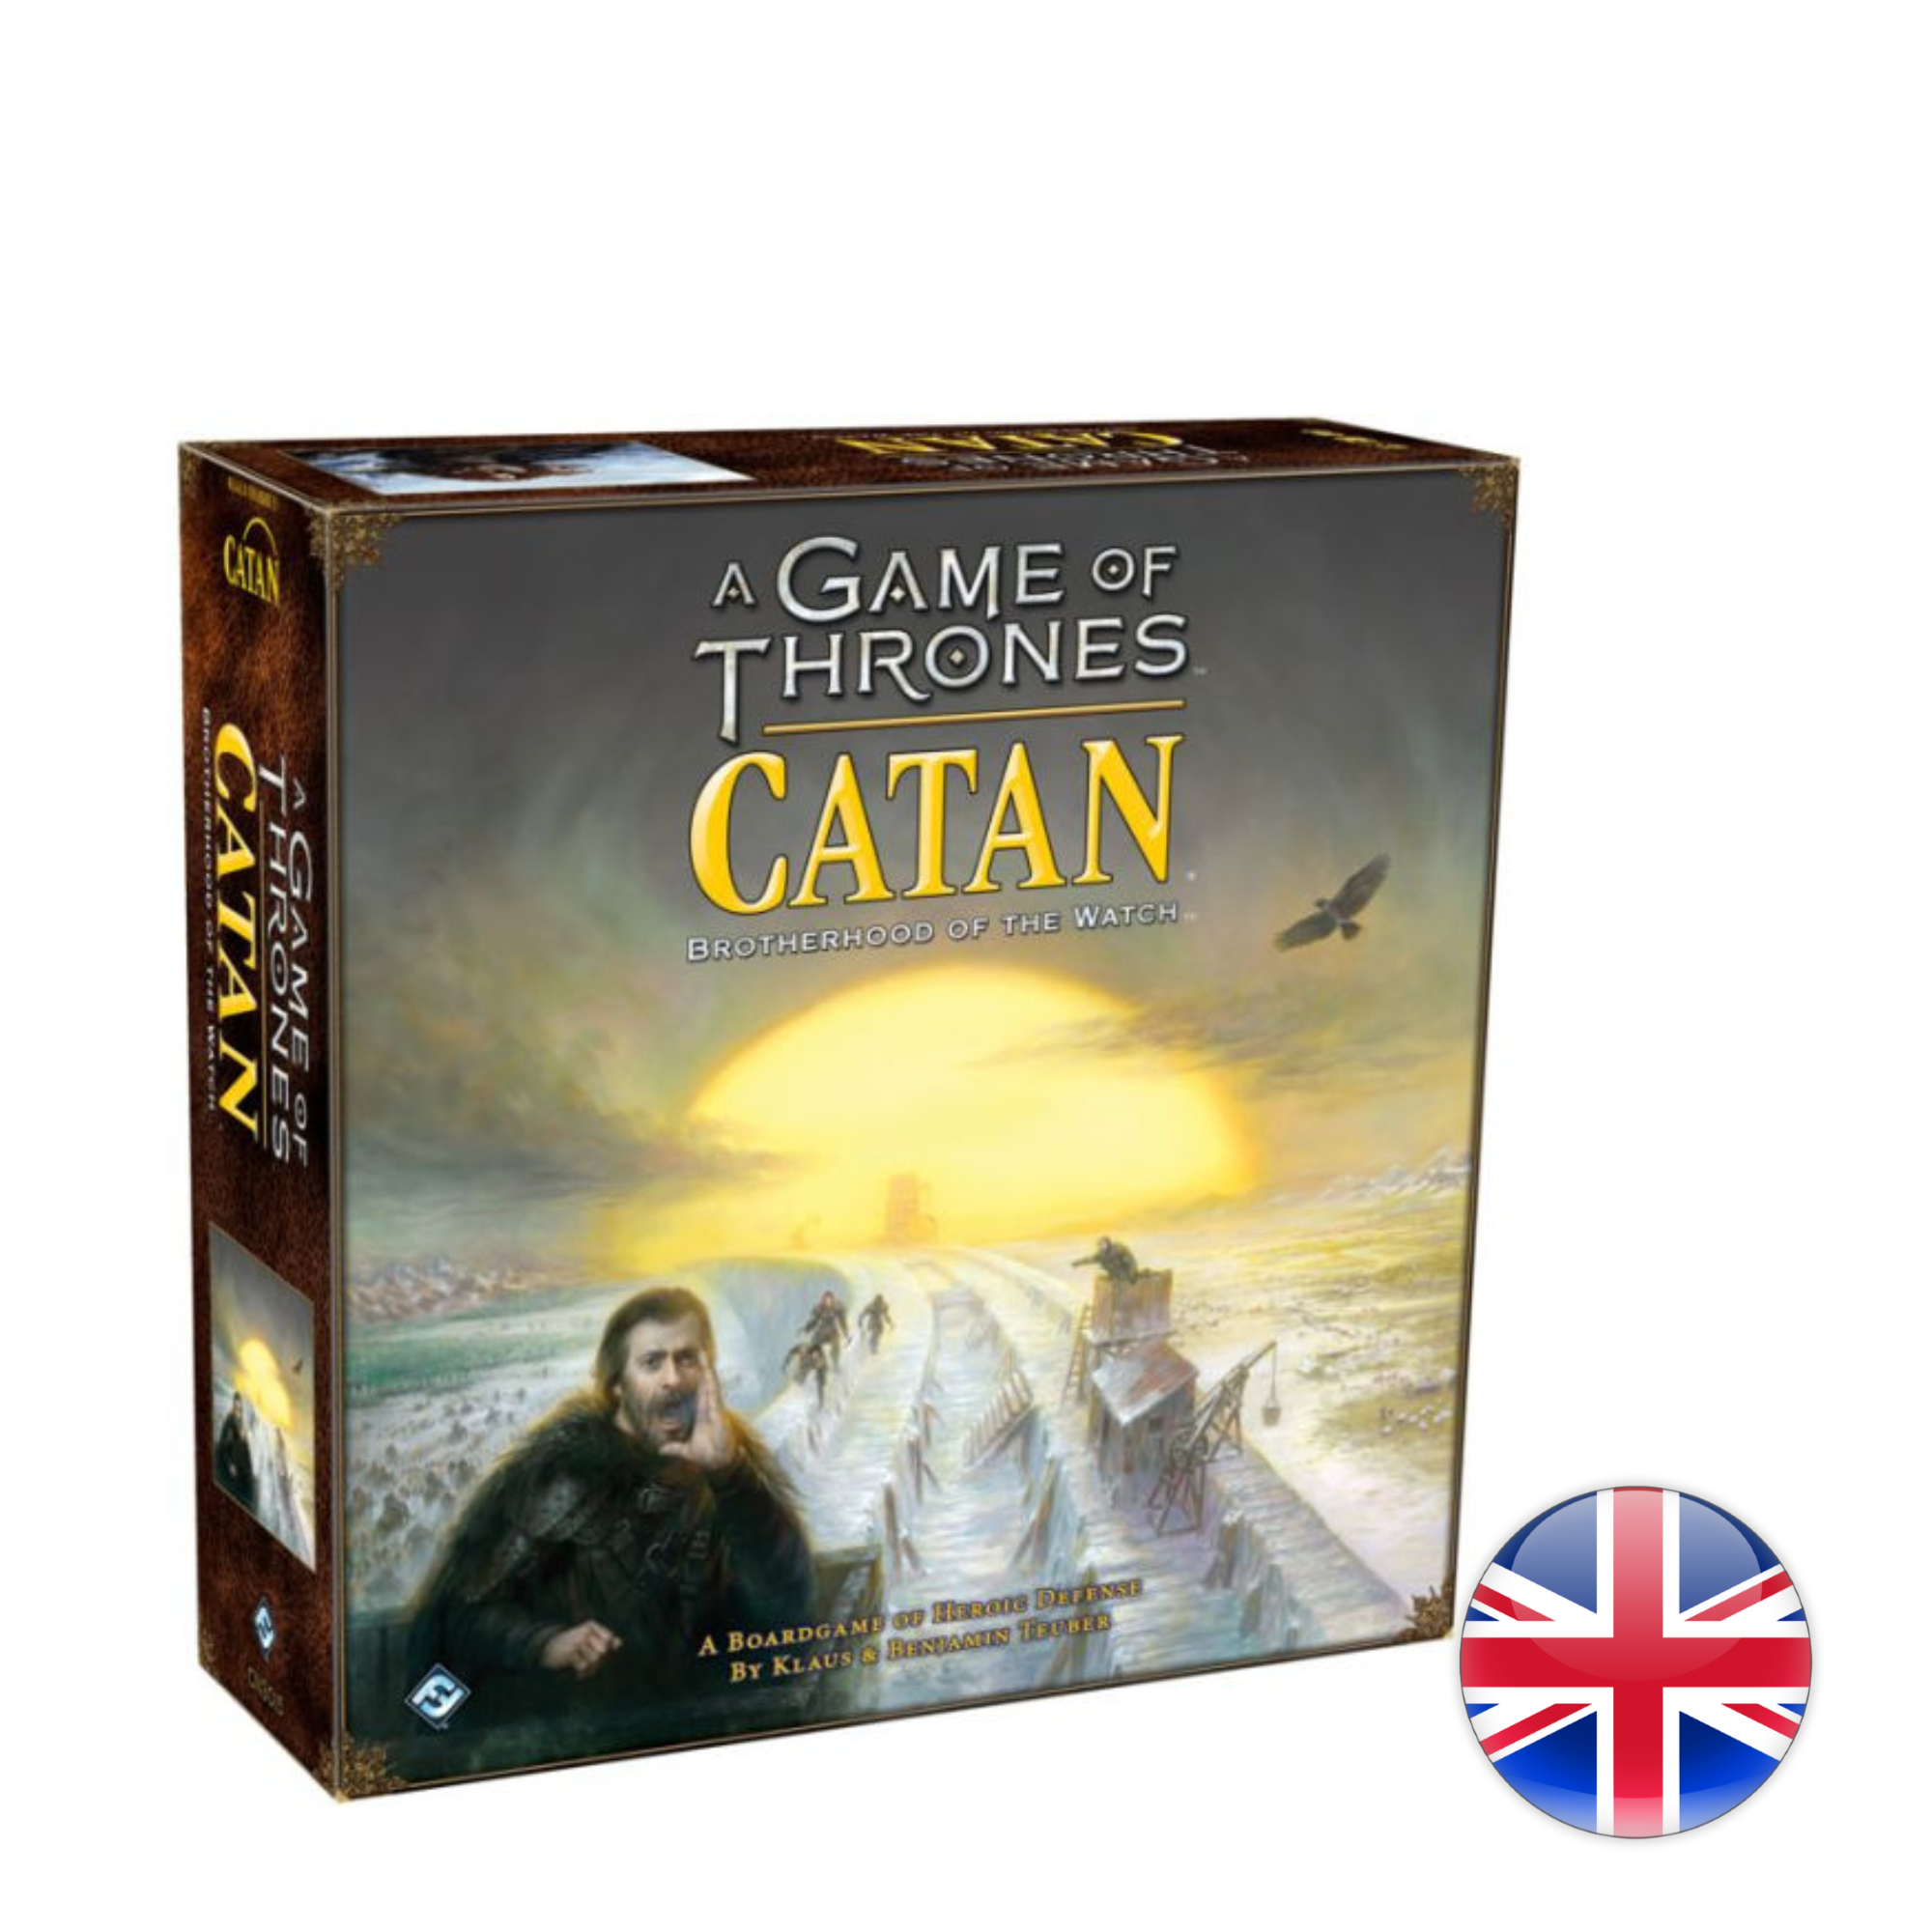 Filosofia Catan - Game of Thrones, Brotherhood of the Watch